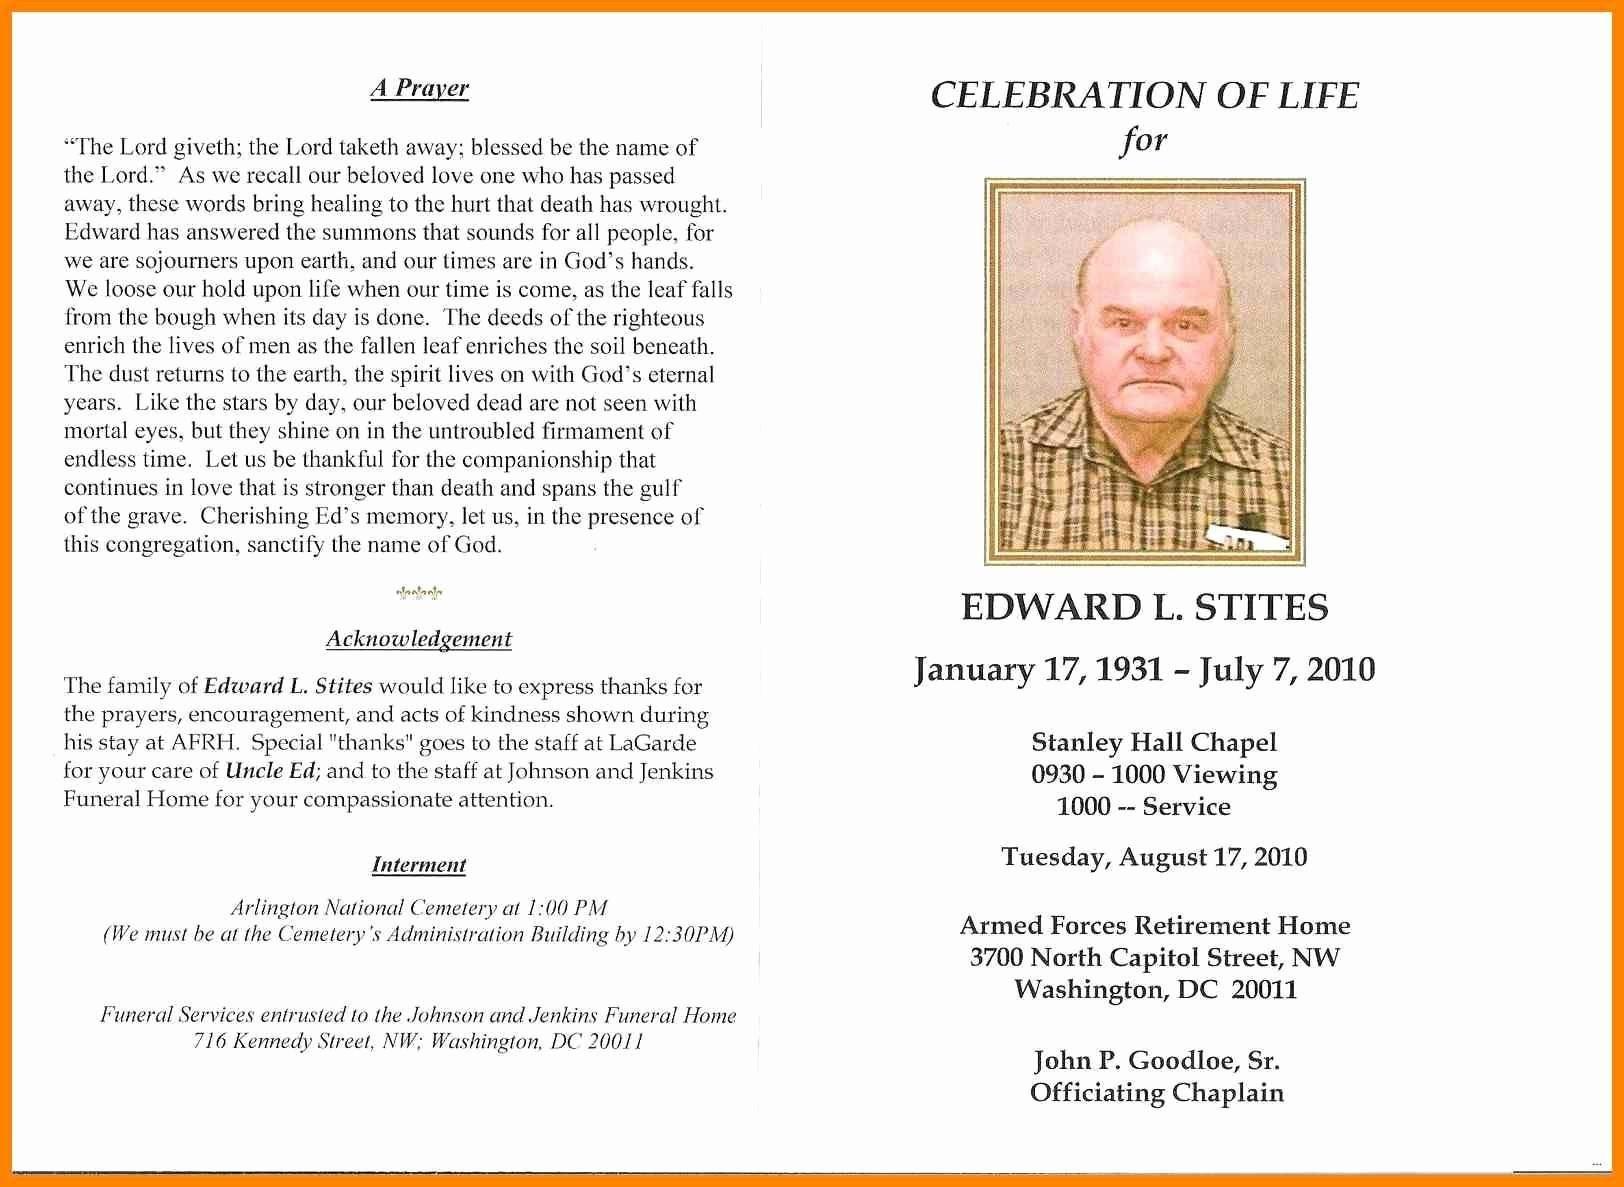 In Memoriam Cards Template Free Celebration Of Life Program - Free Printable Memorial Card Template